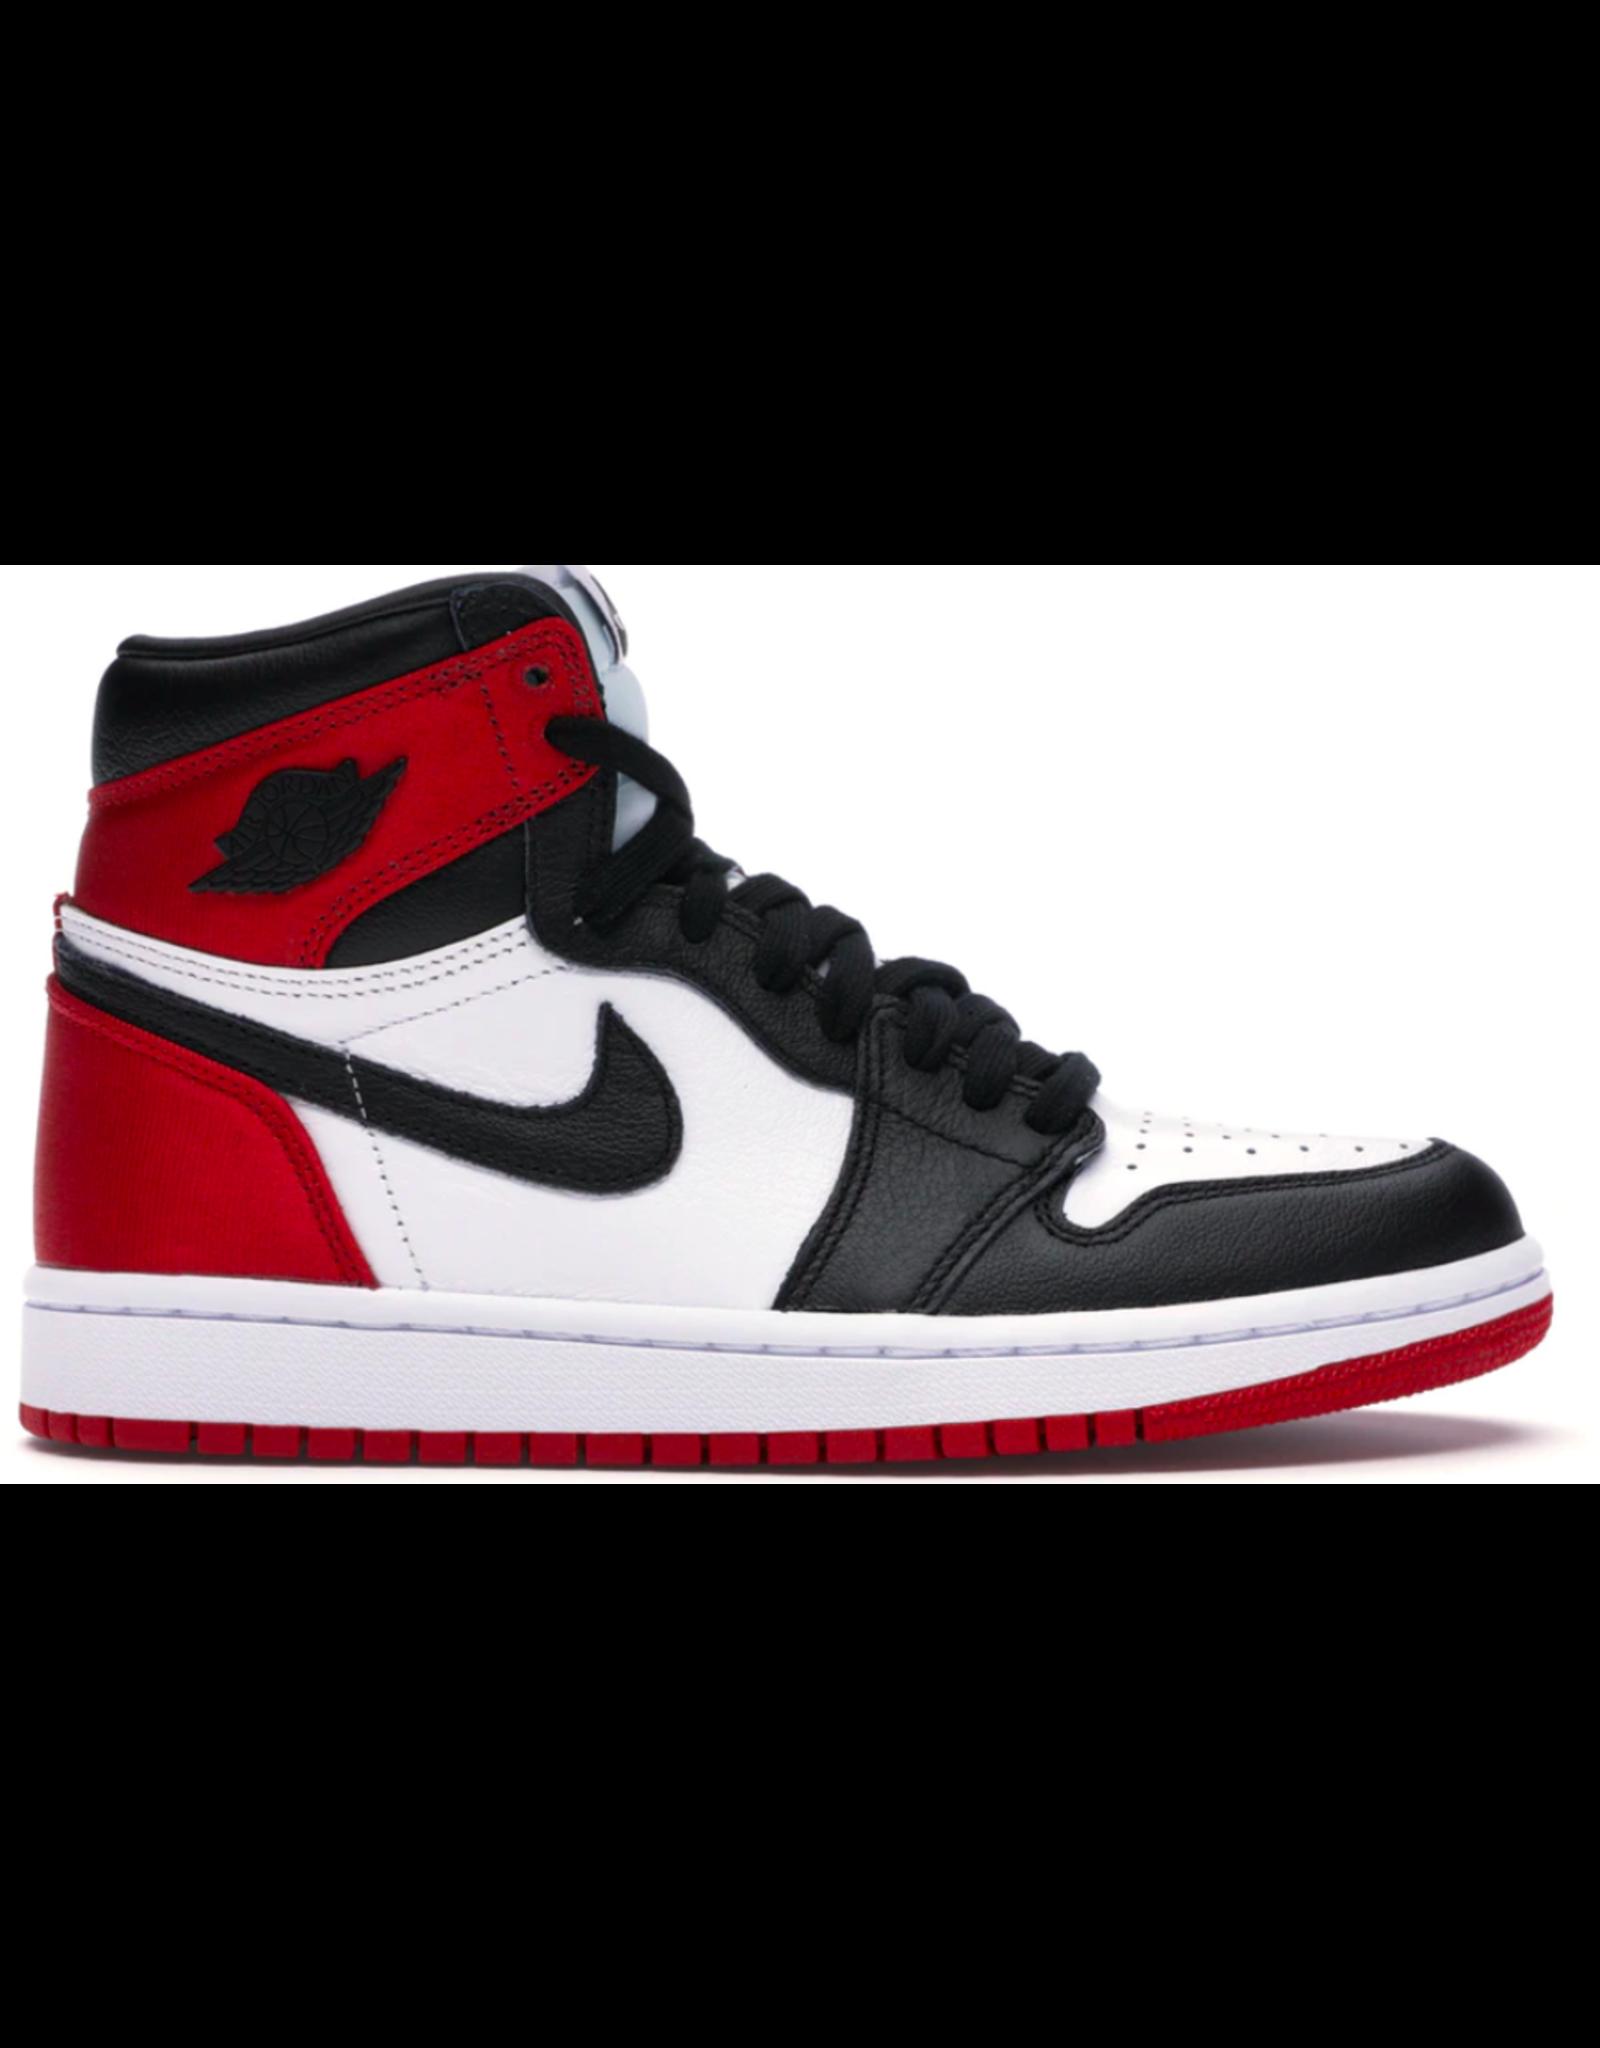 JORDAN Jordan 1 Retro High Satin Black Toe (W)